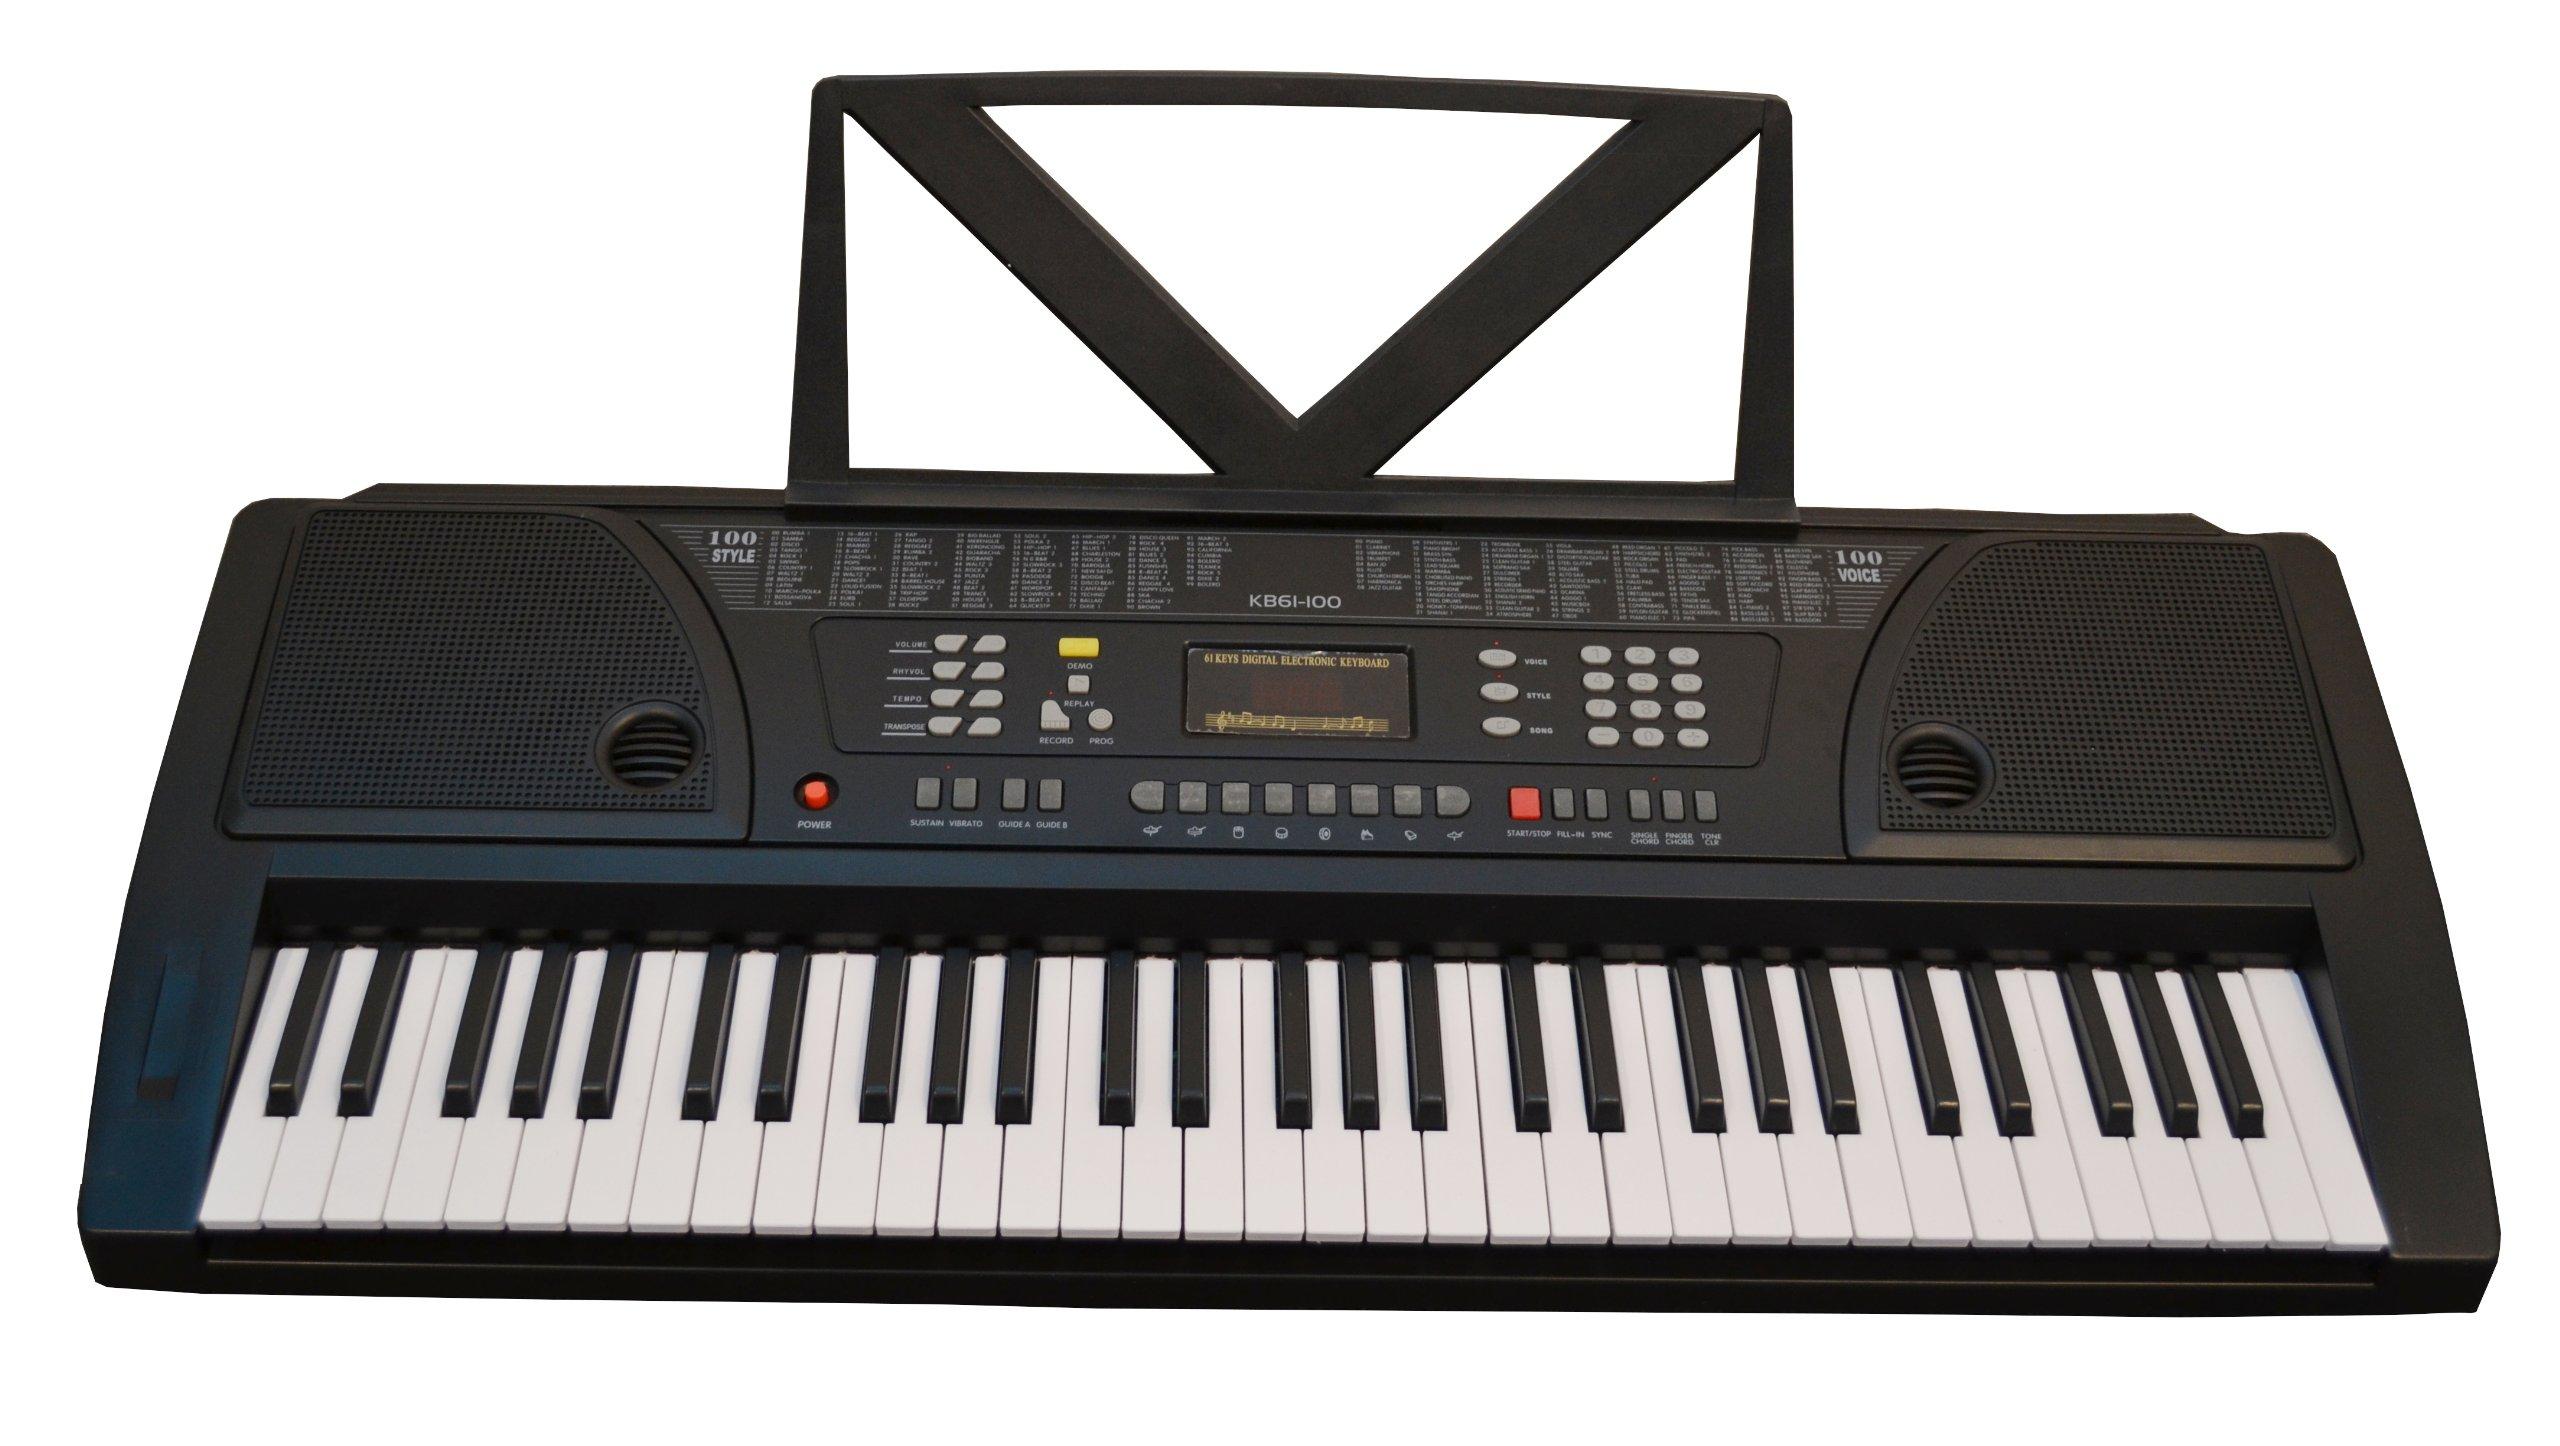 Huntington KB61 61-Key Portable Electronic Keyboard, Black by Huntington